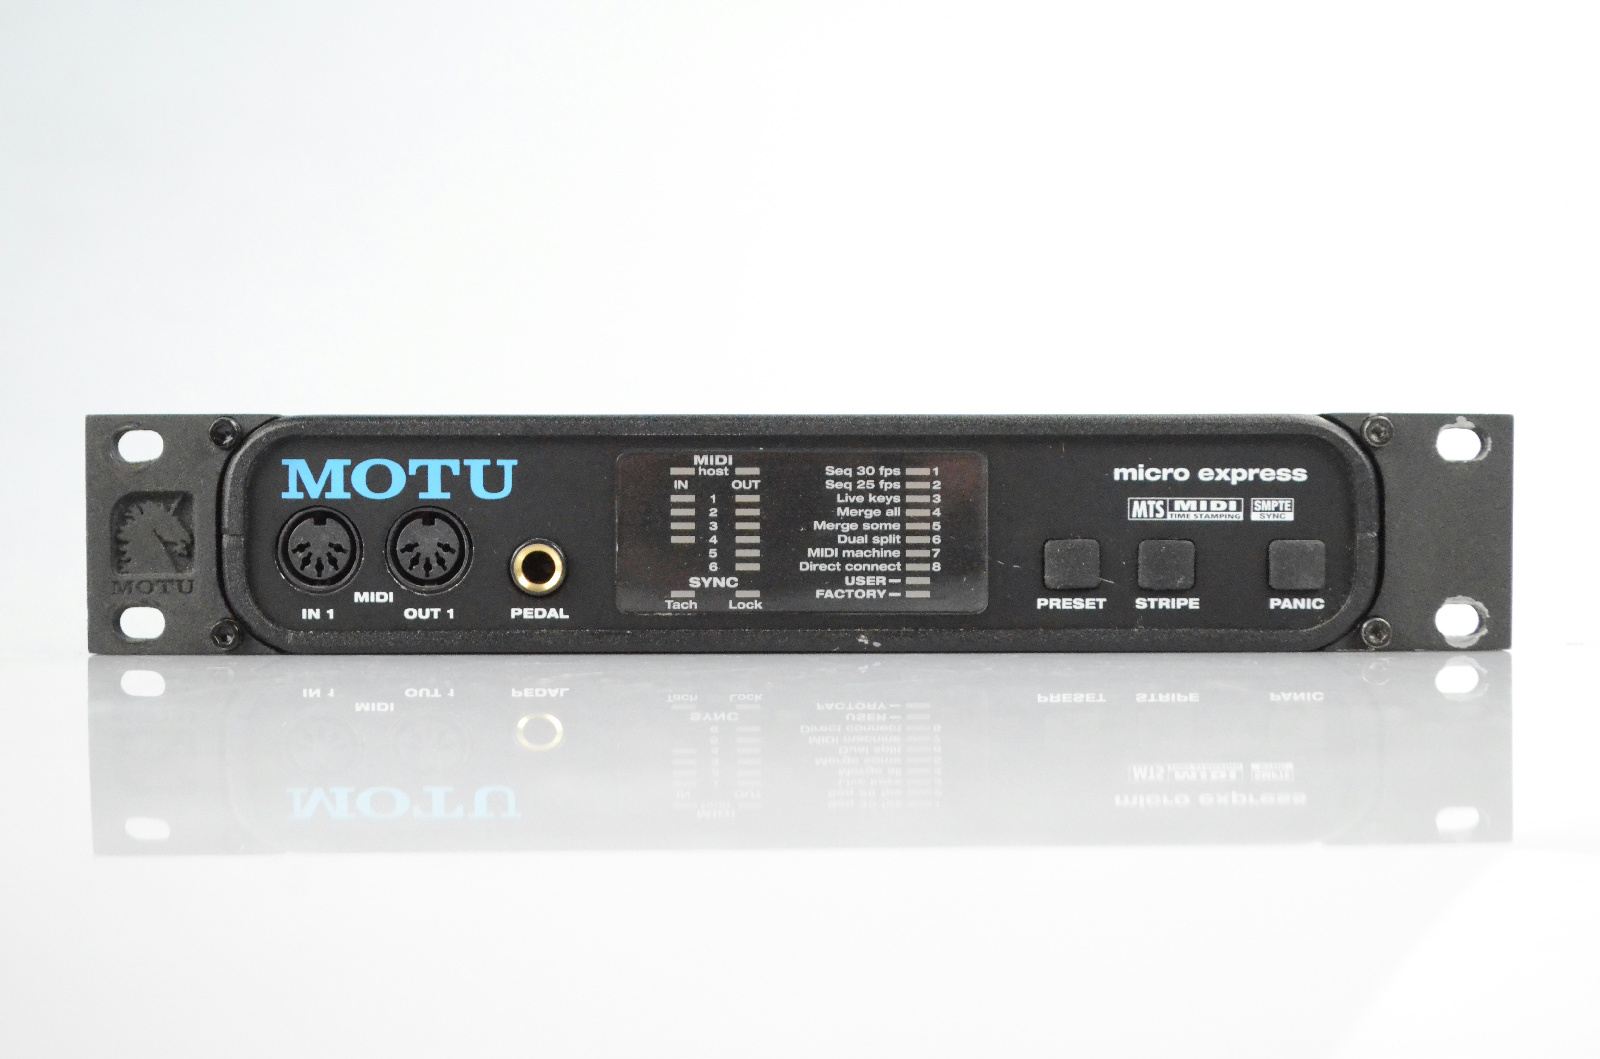 MOTU Micro Express 4x6 USB MIDI SMPTE Interface Owned by Kato Khandwala #33737